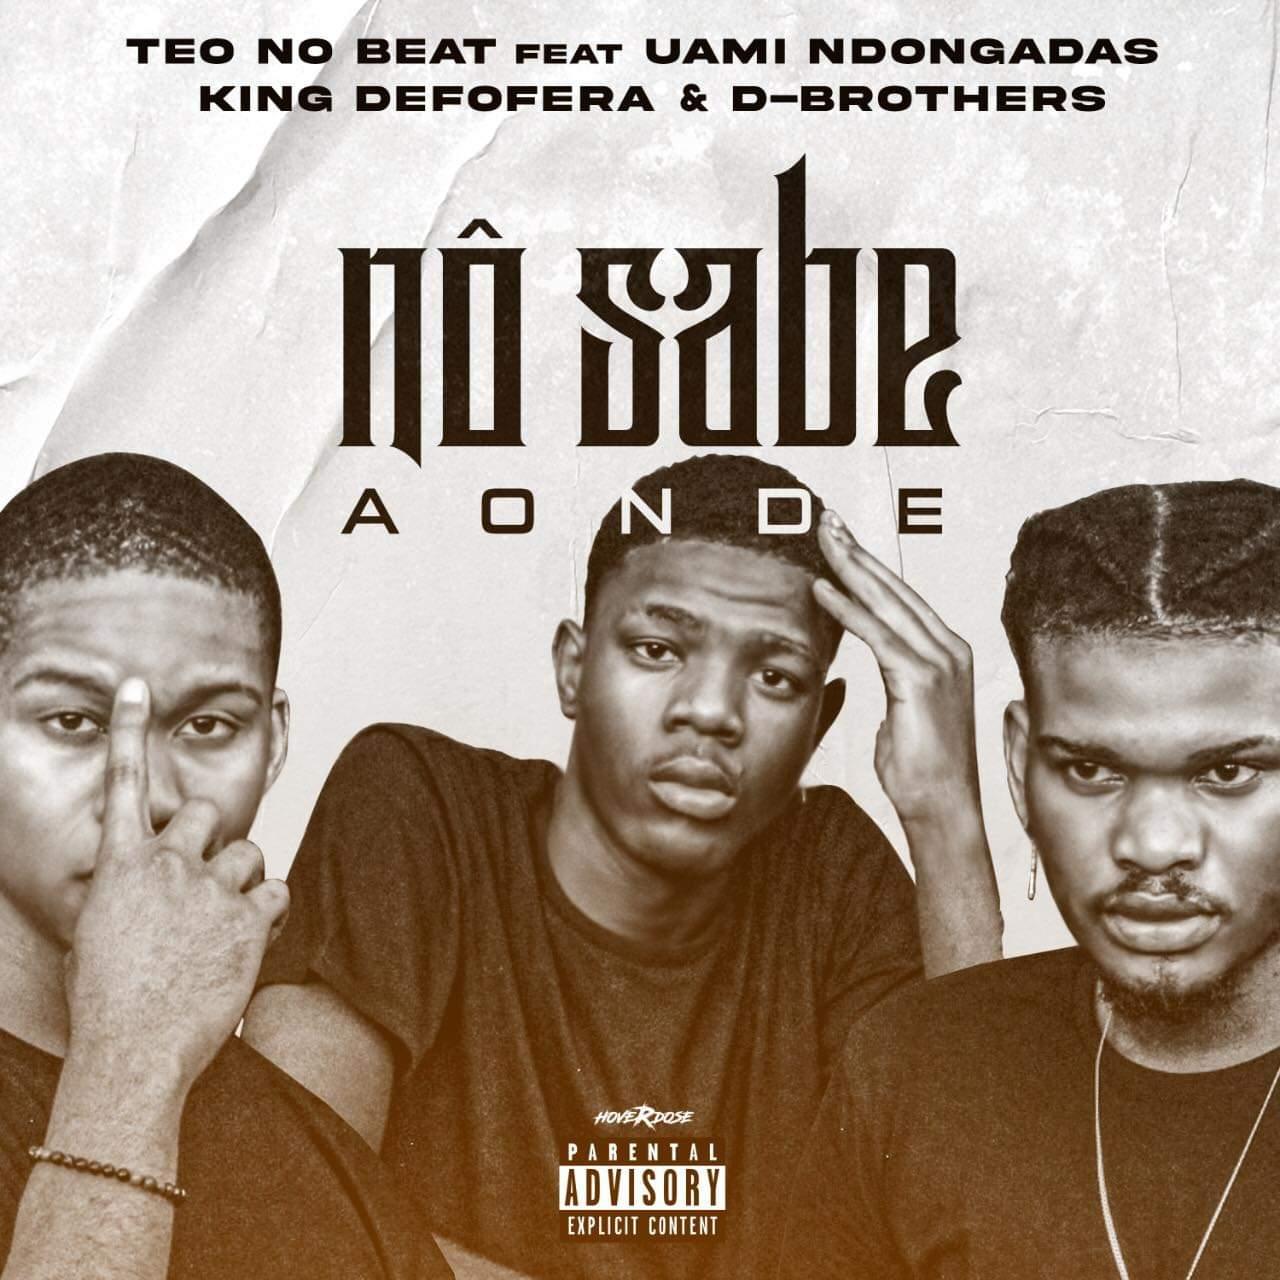 Teo no Beat feat. Uami Ndongadas King Defofera & D-Brothers - Nô Sabe Aonde